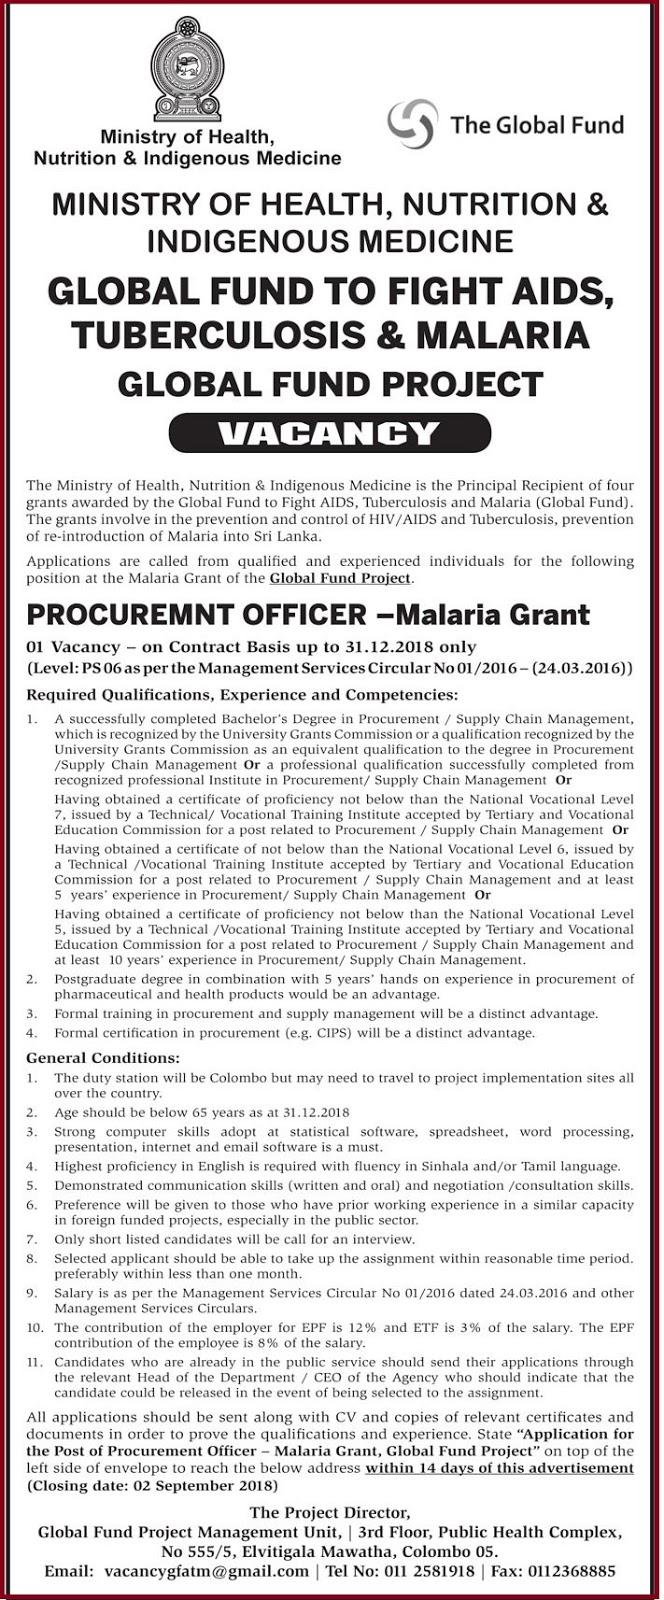 Procurement Officer - Malaria Grant